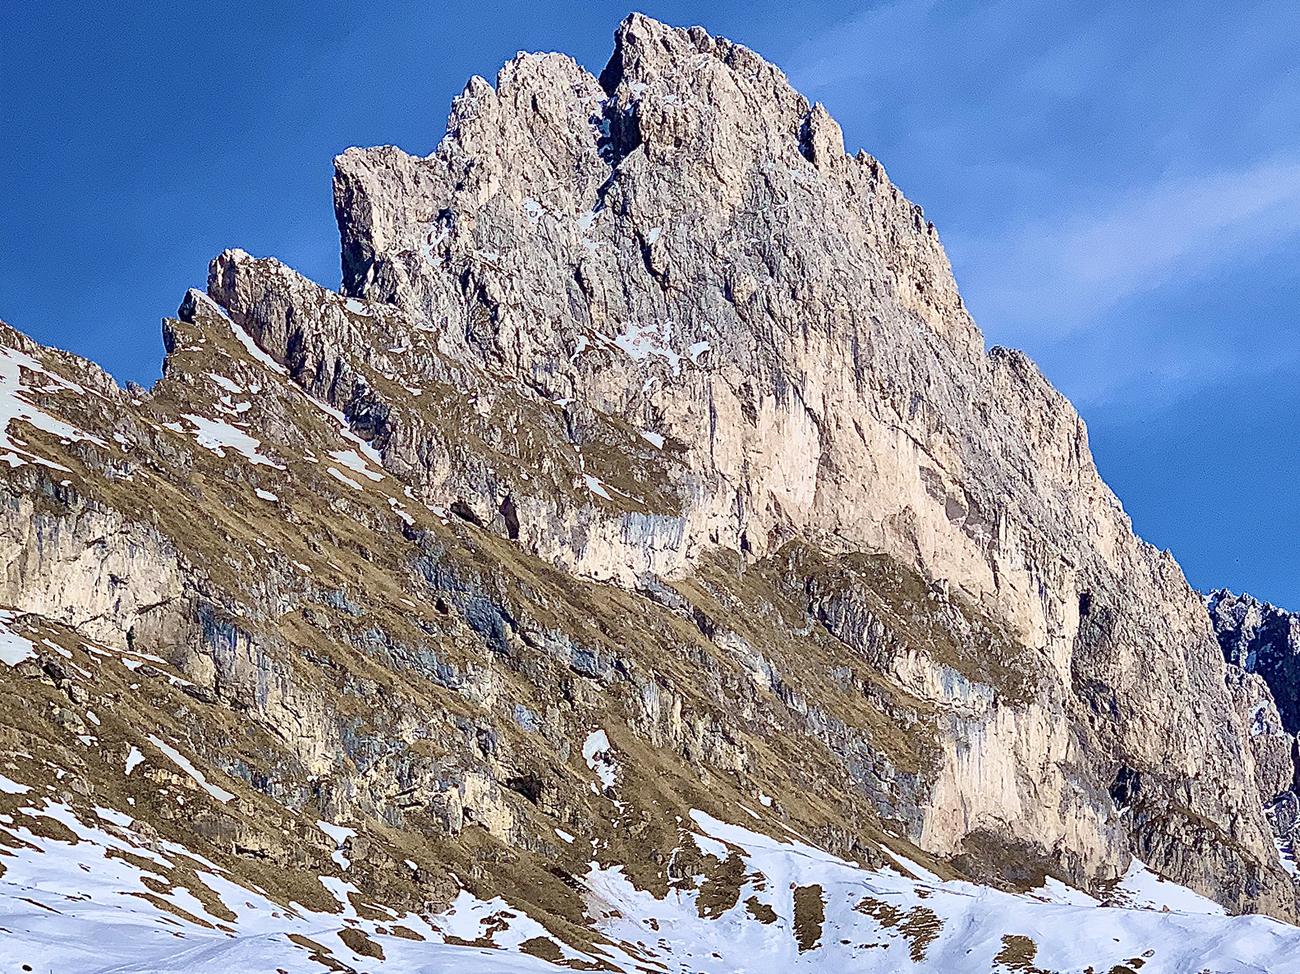 Bulla Mule Dolomites